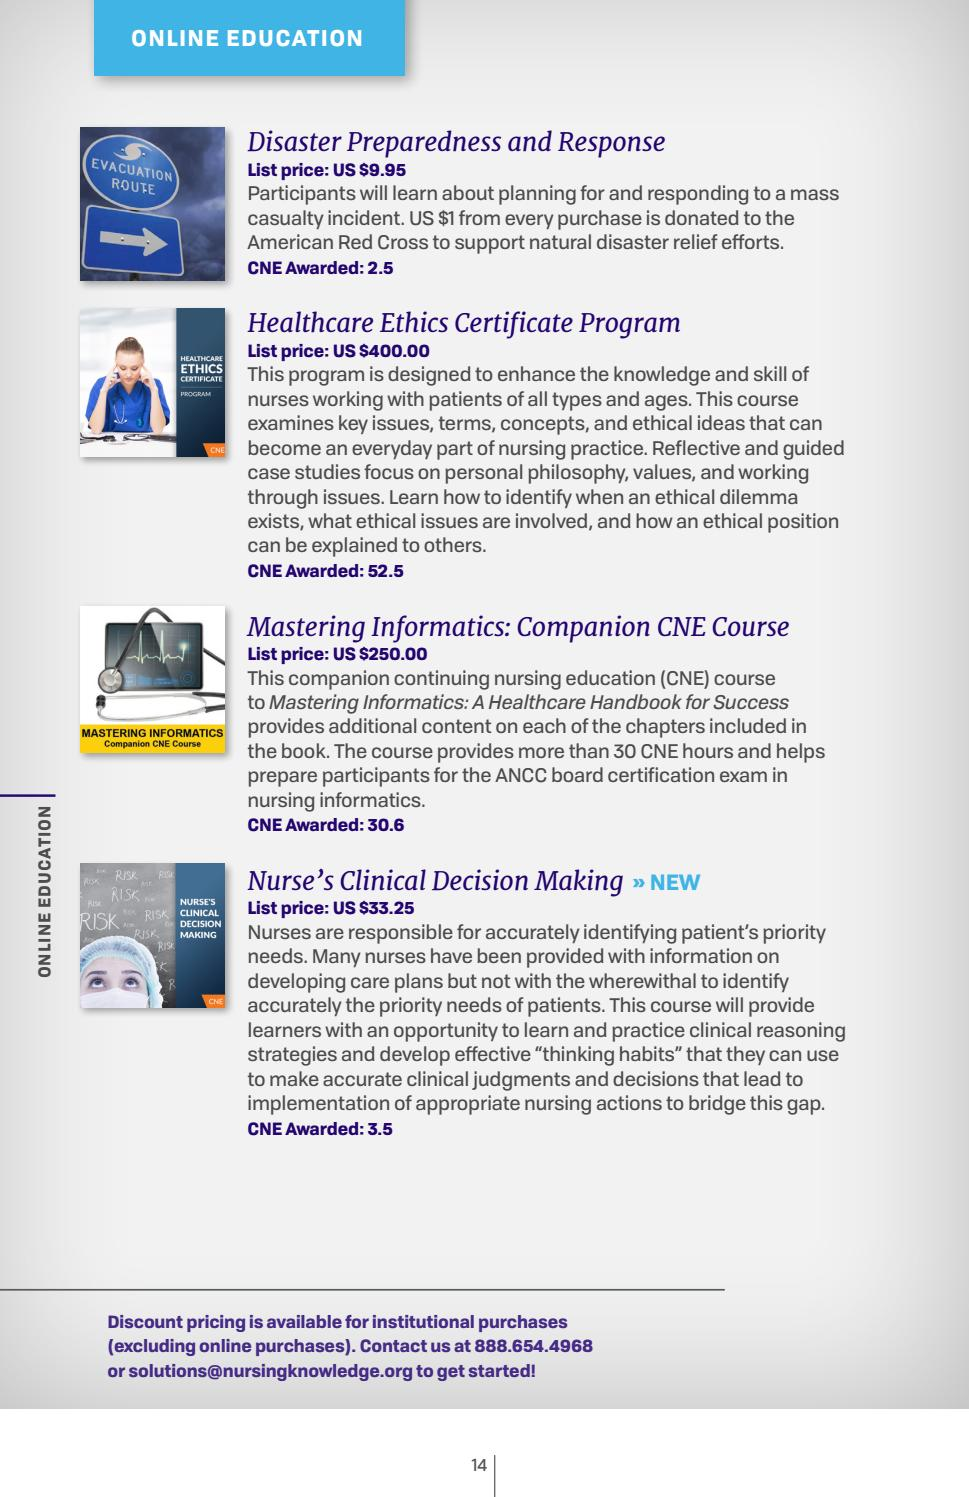 Adoptable Resources Catalog By Sigma Theta Tau International